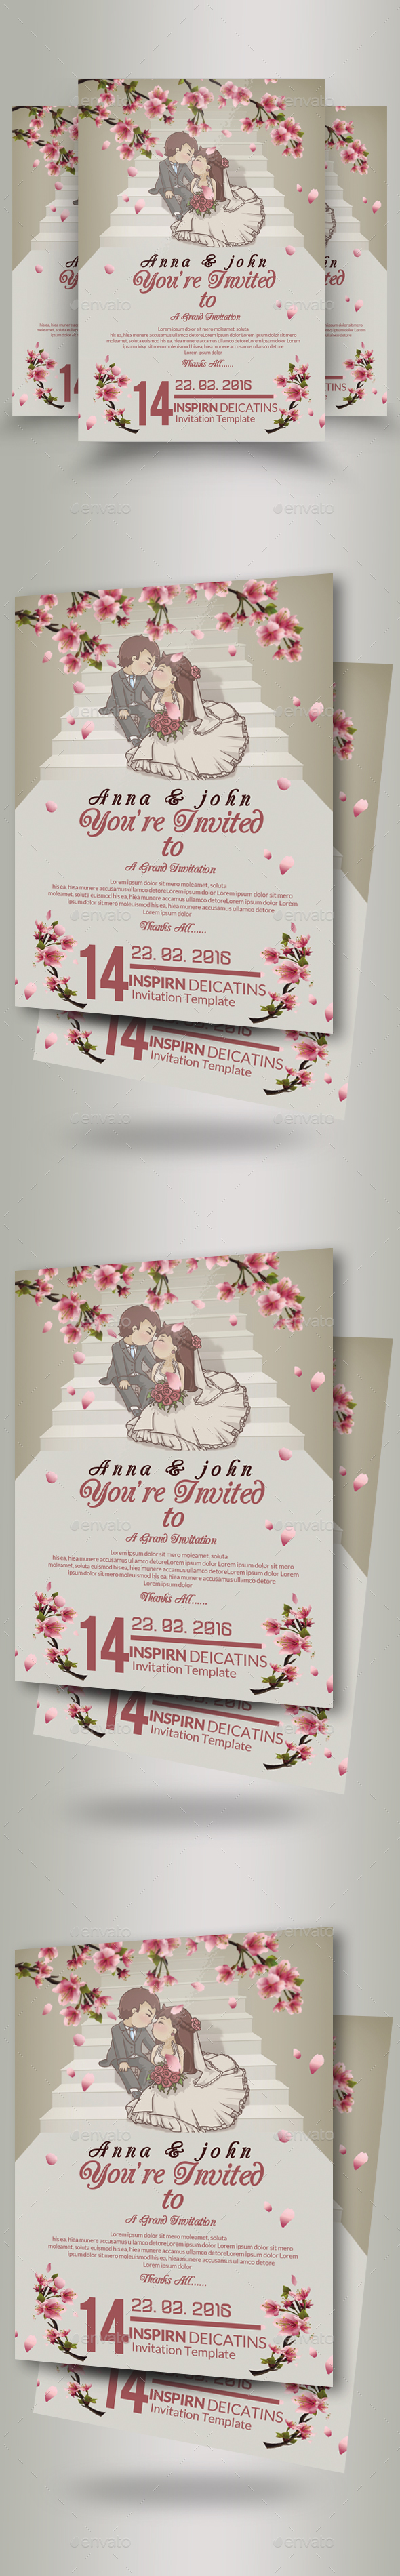 GraphicRiver Wedding Invitation Flyer Template 20913656